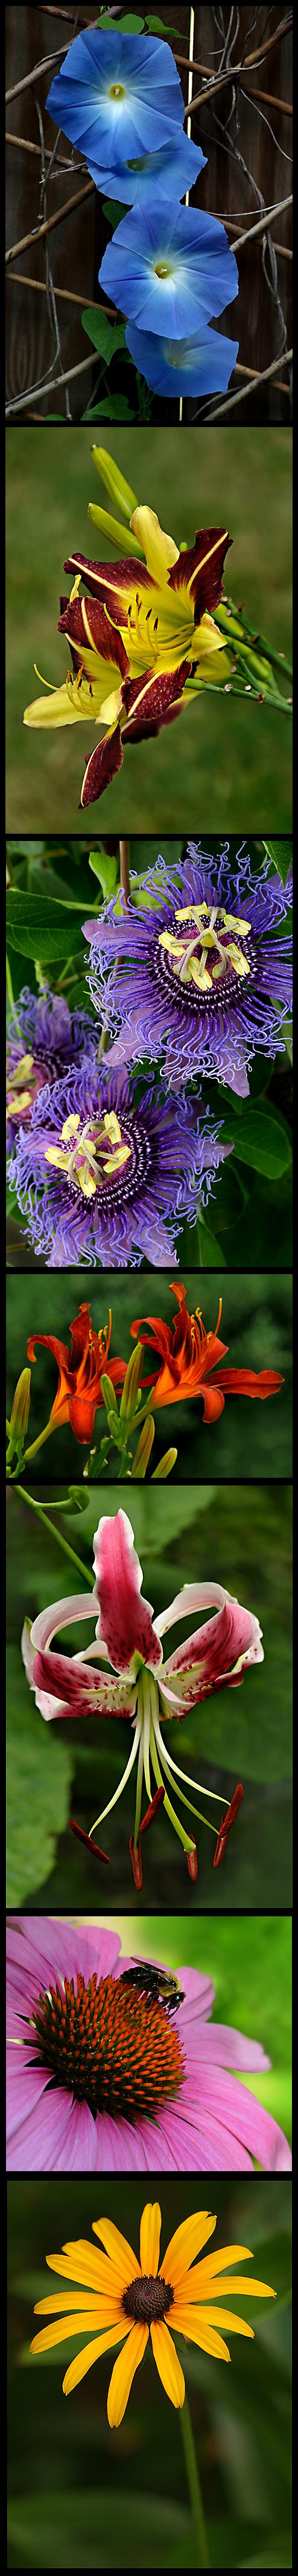 Blooms7172009